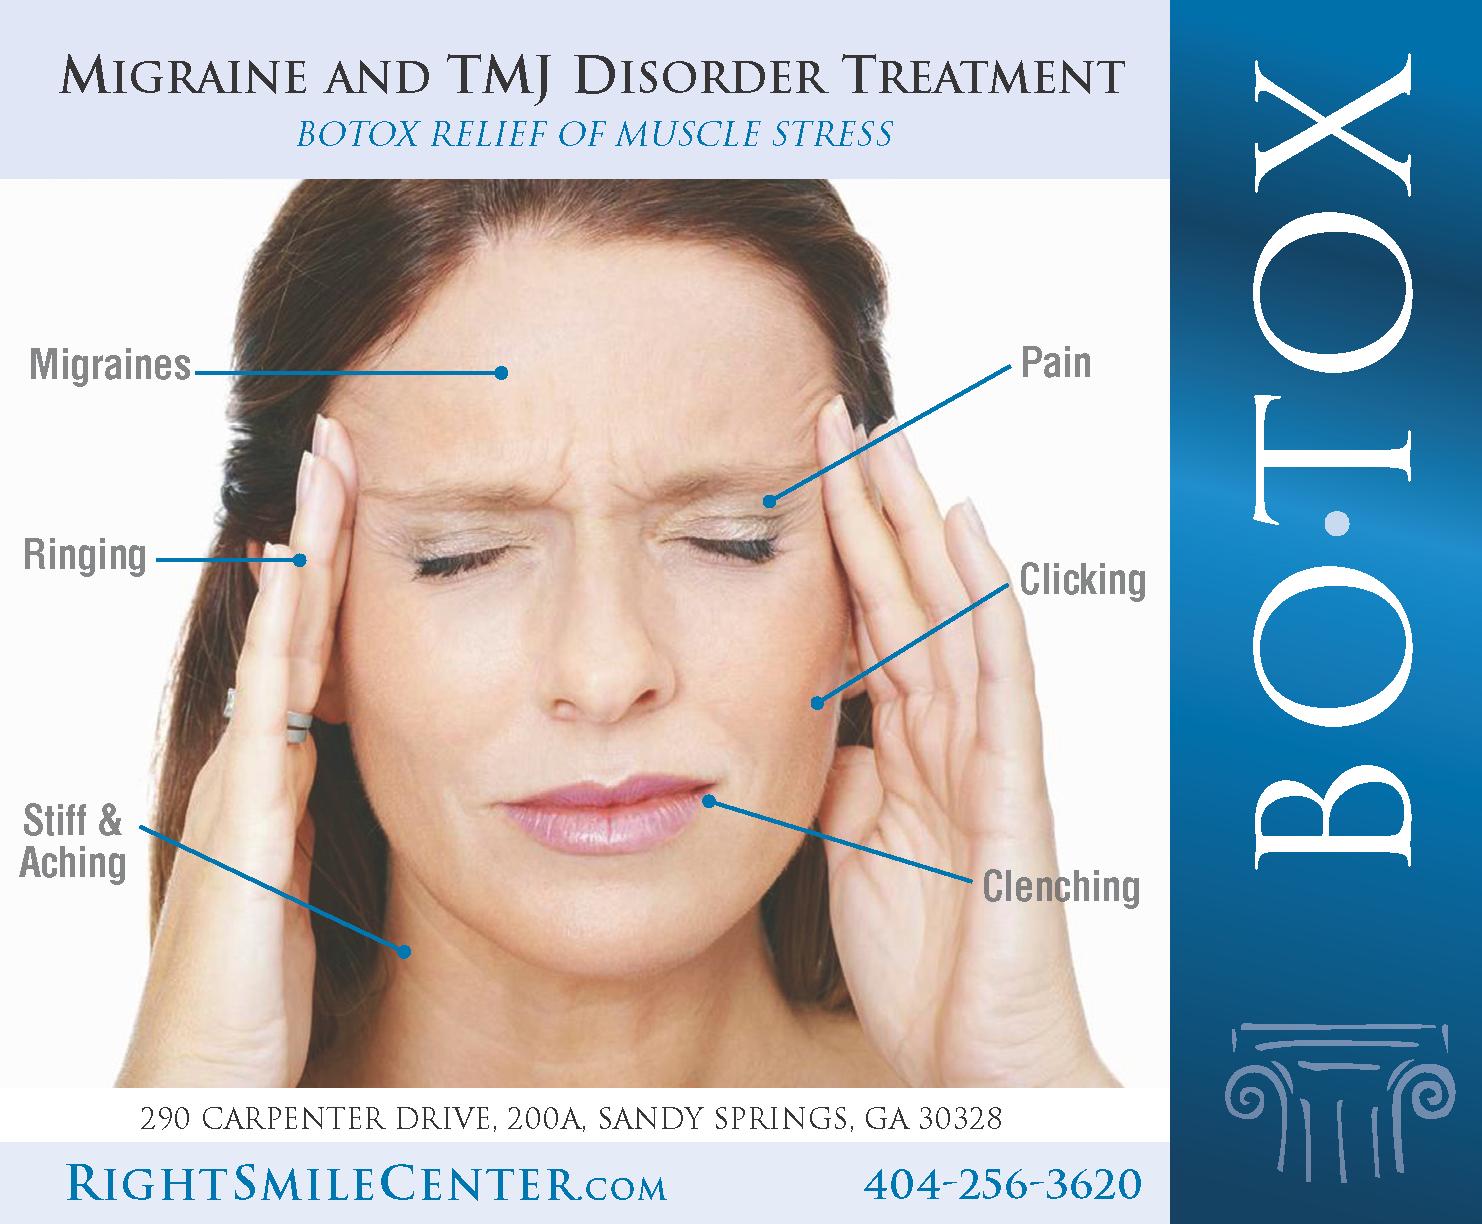 Botox treatment of migraine headaches